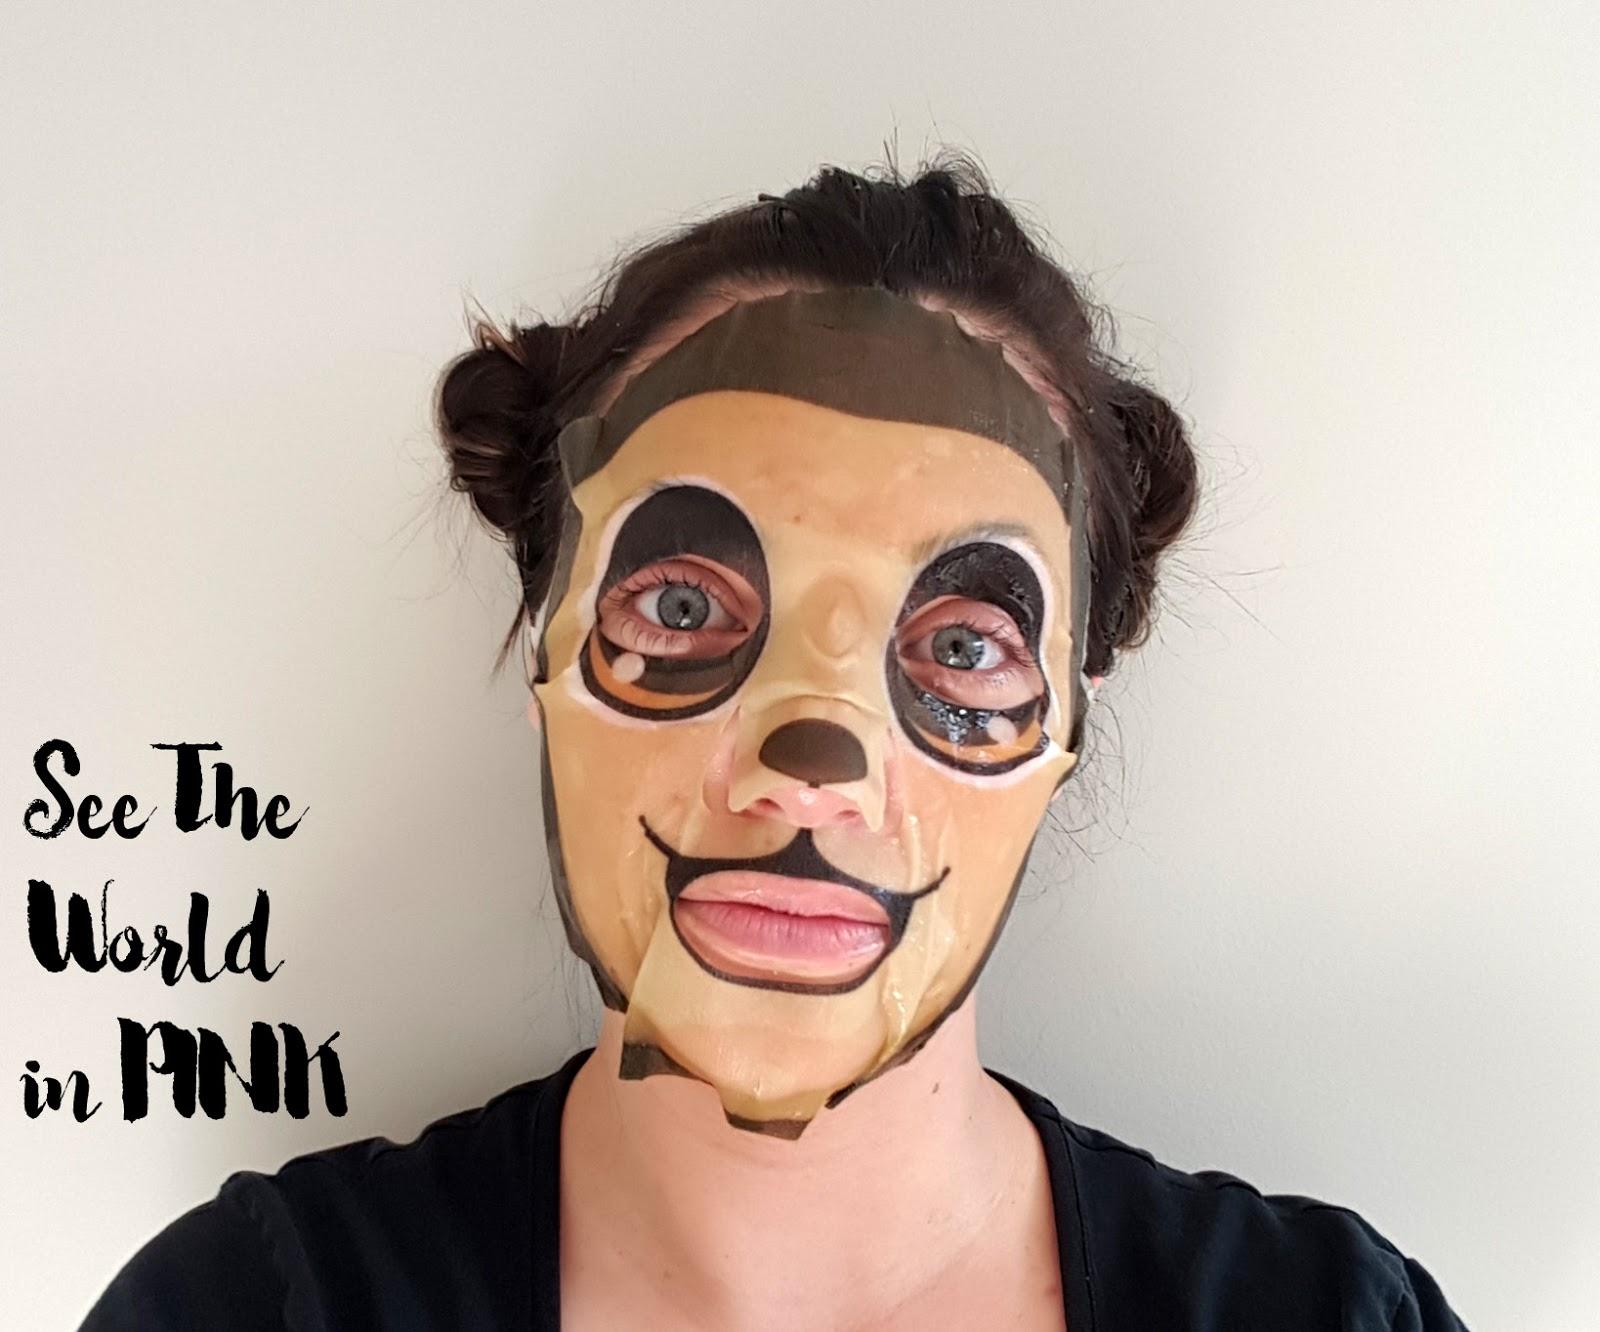 thefaceshop character mask monkey soothing